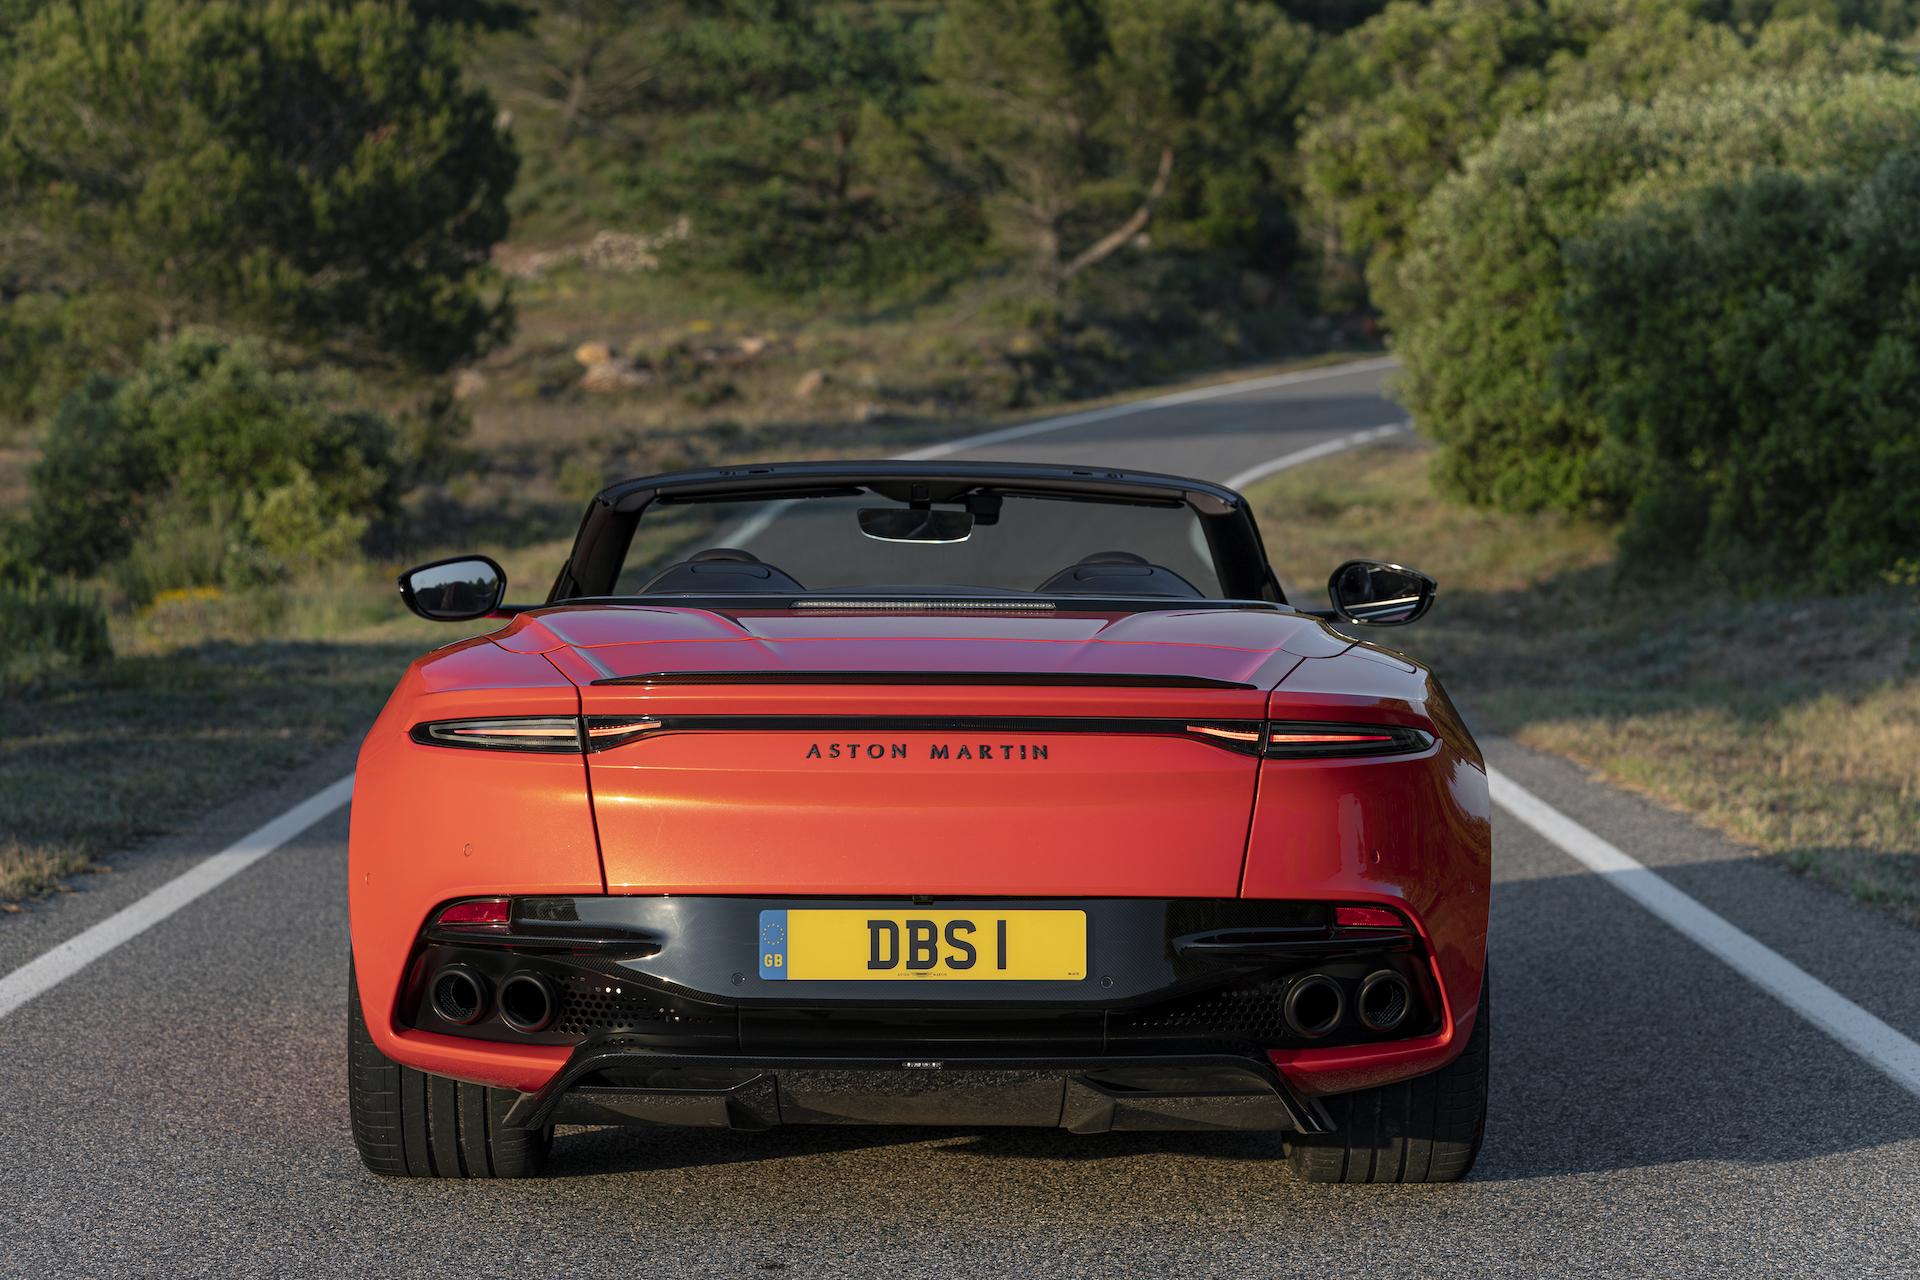 2020 Land Rover Defender, 2020 Aston Martin DBS, future ...